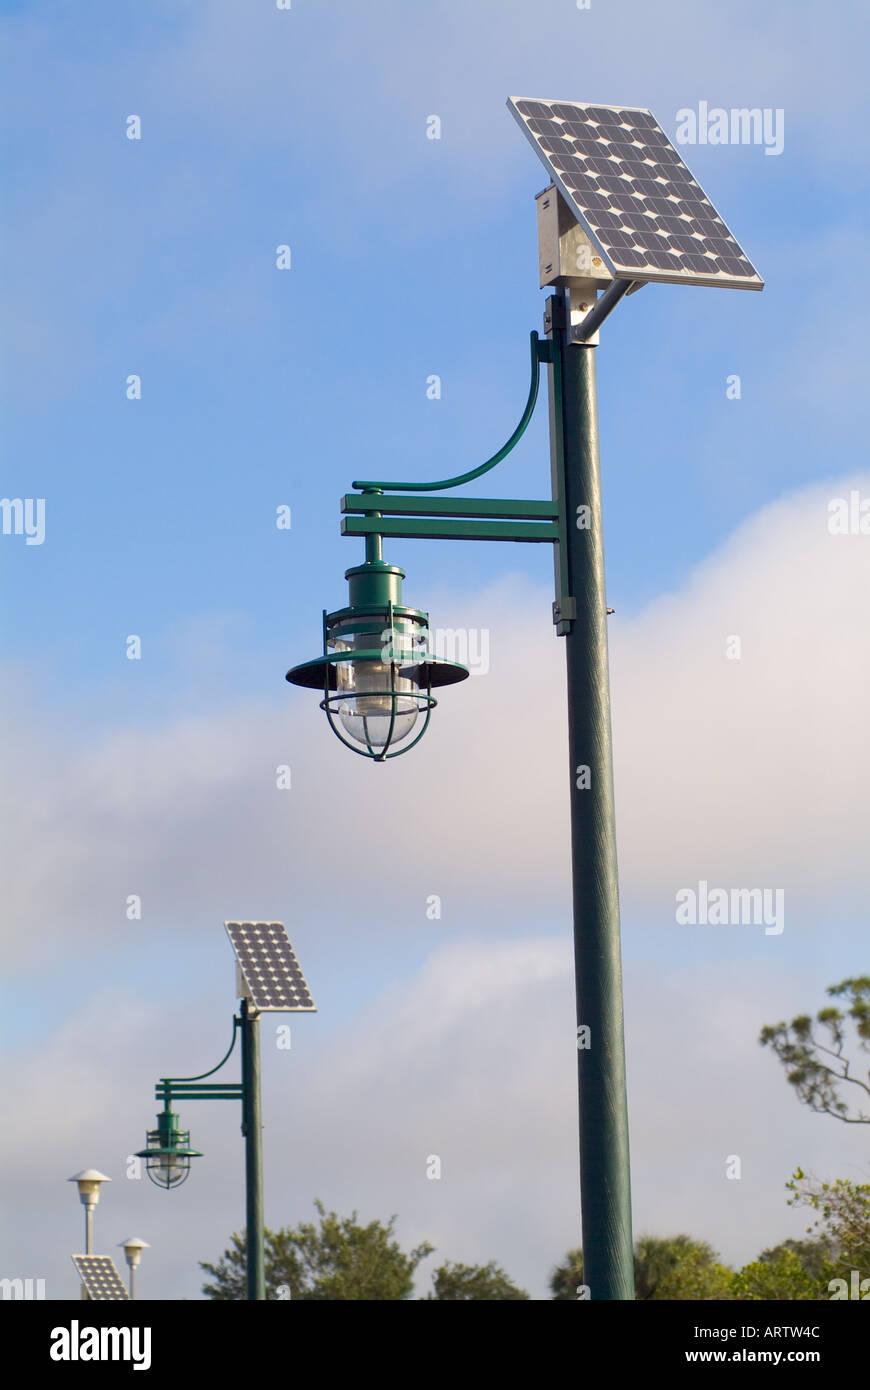 Solar Powered Lights Lighting Outdoor Illumination Alternative Energy Stock Photo Alamy